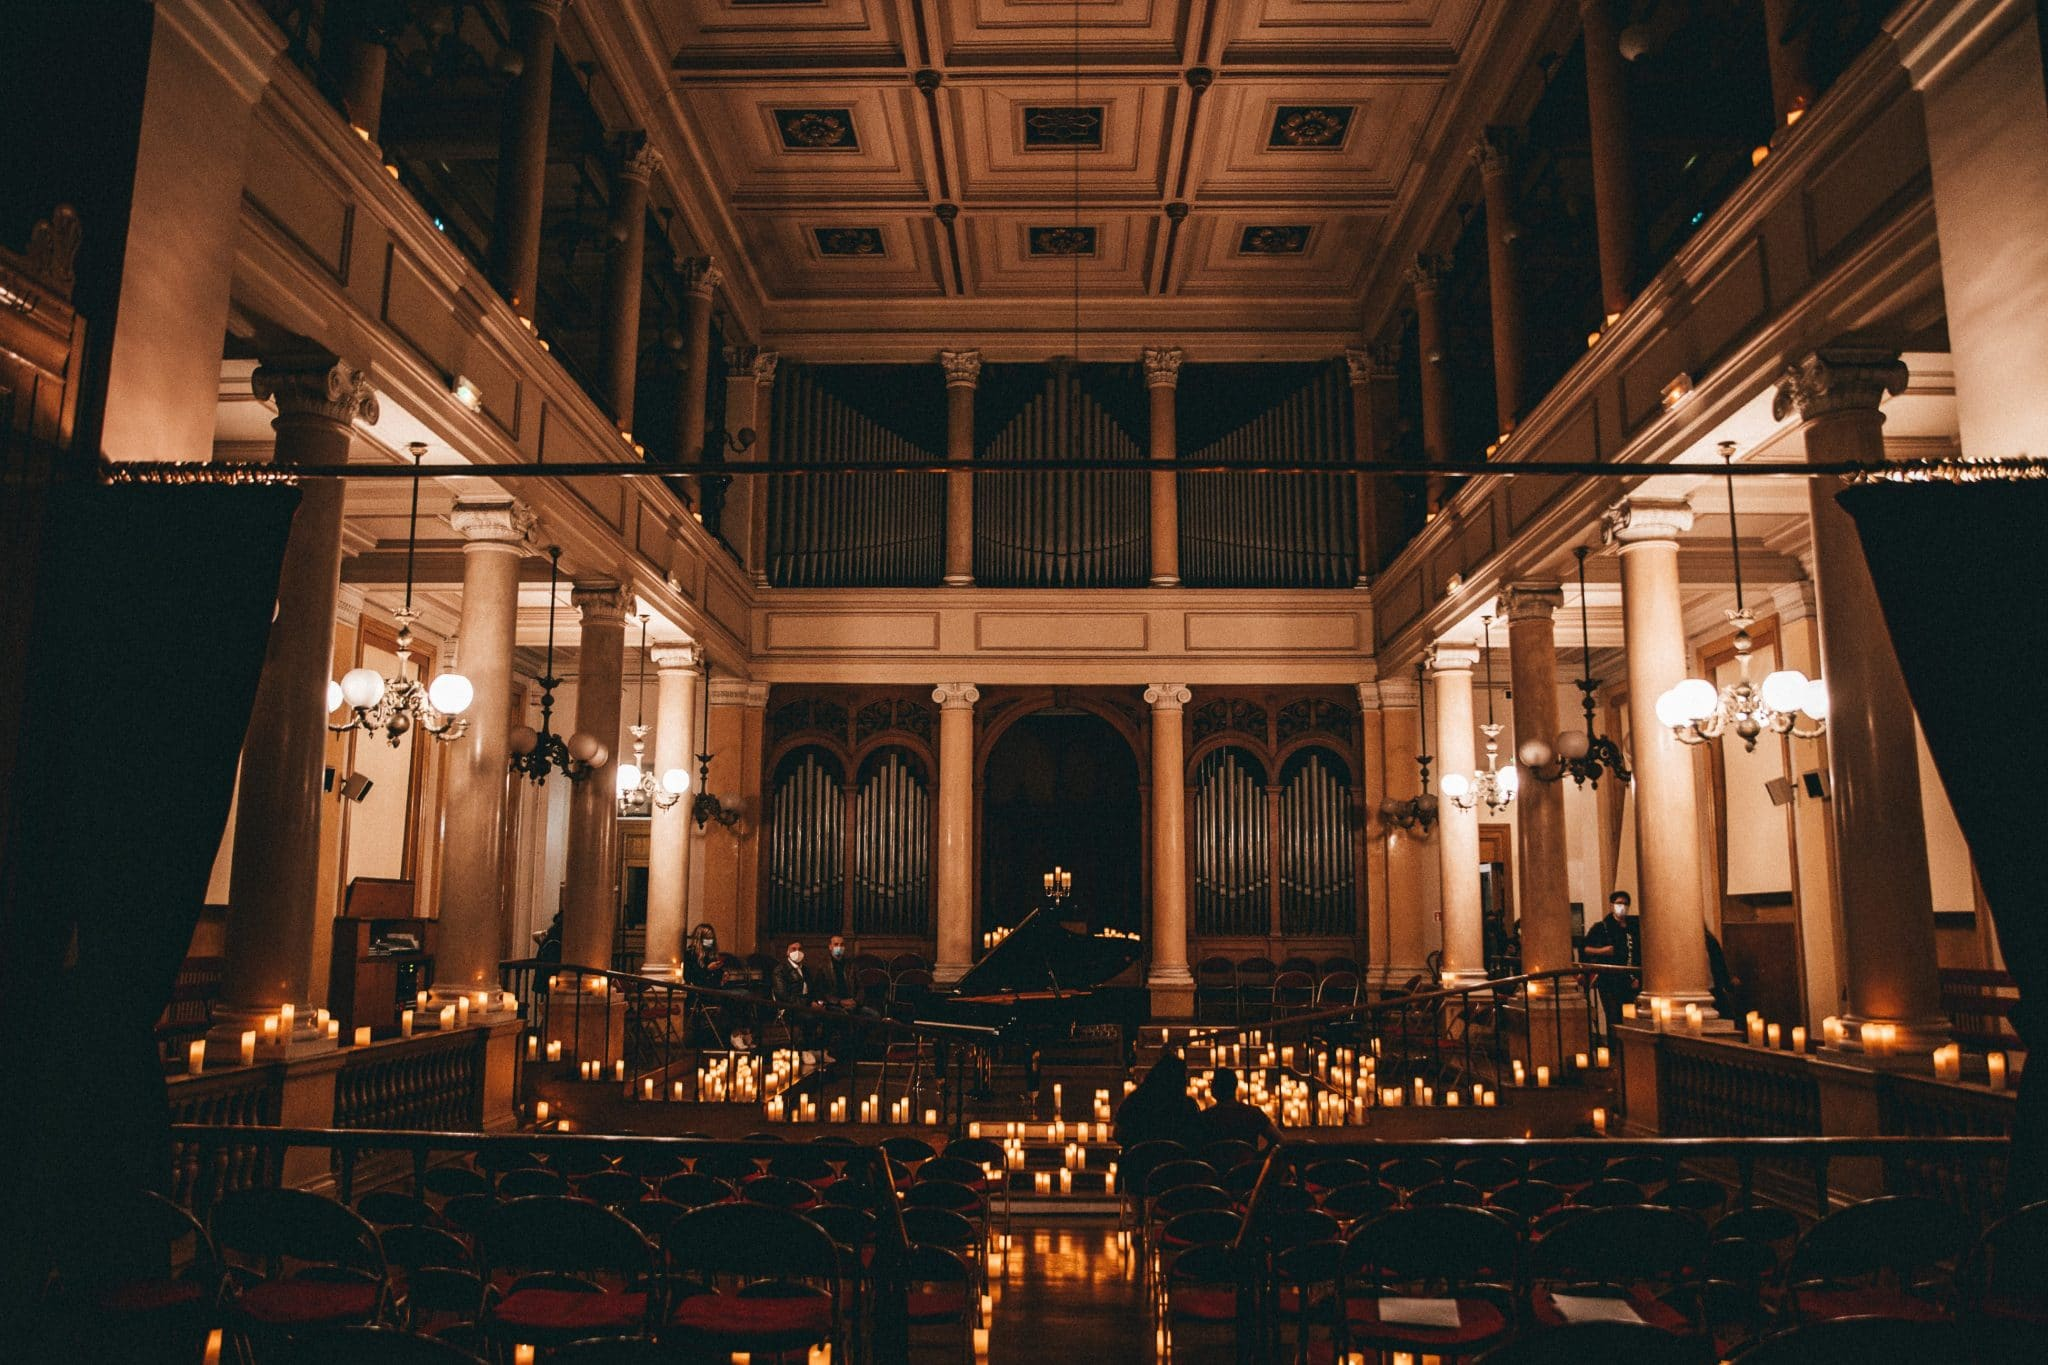 inja concert candlelight paris institut national jeunes aveugles musique classique 2